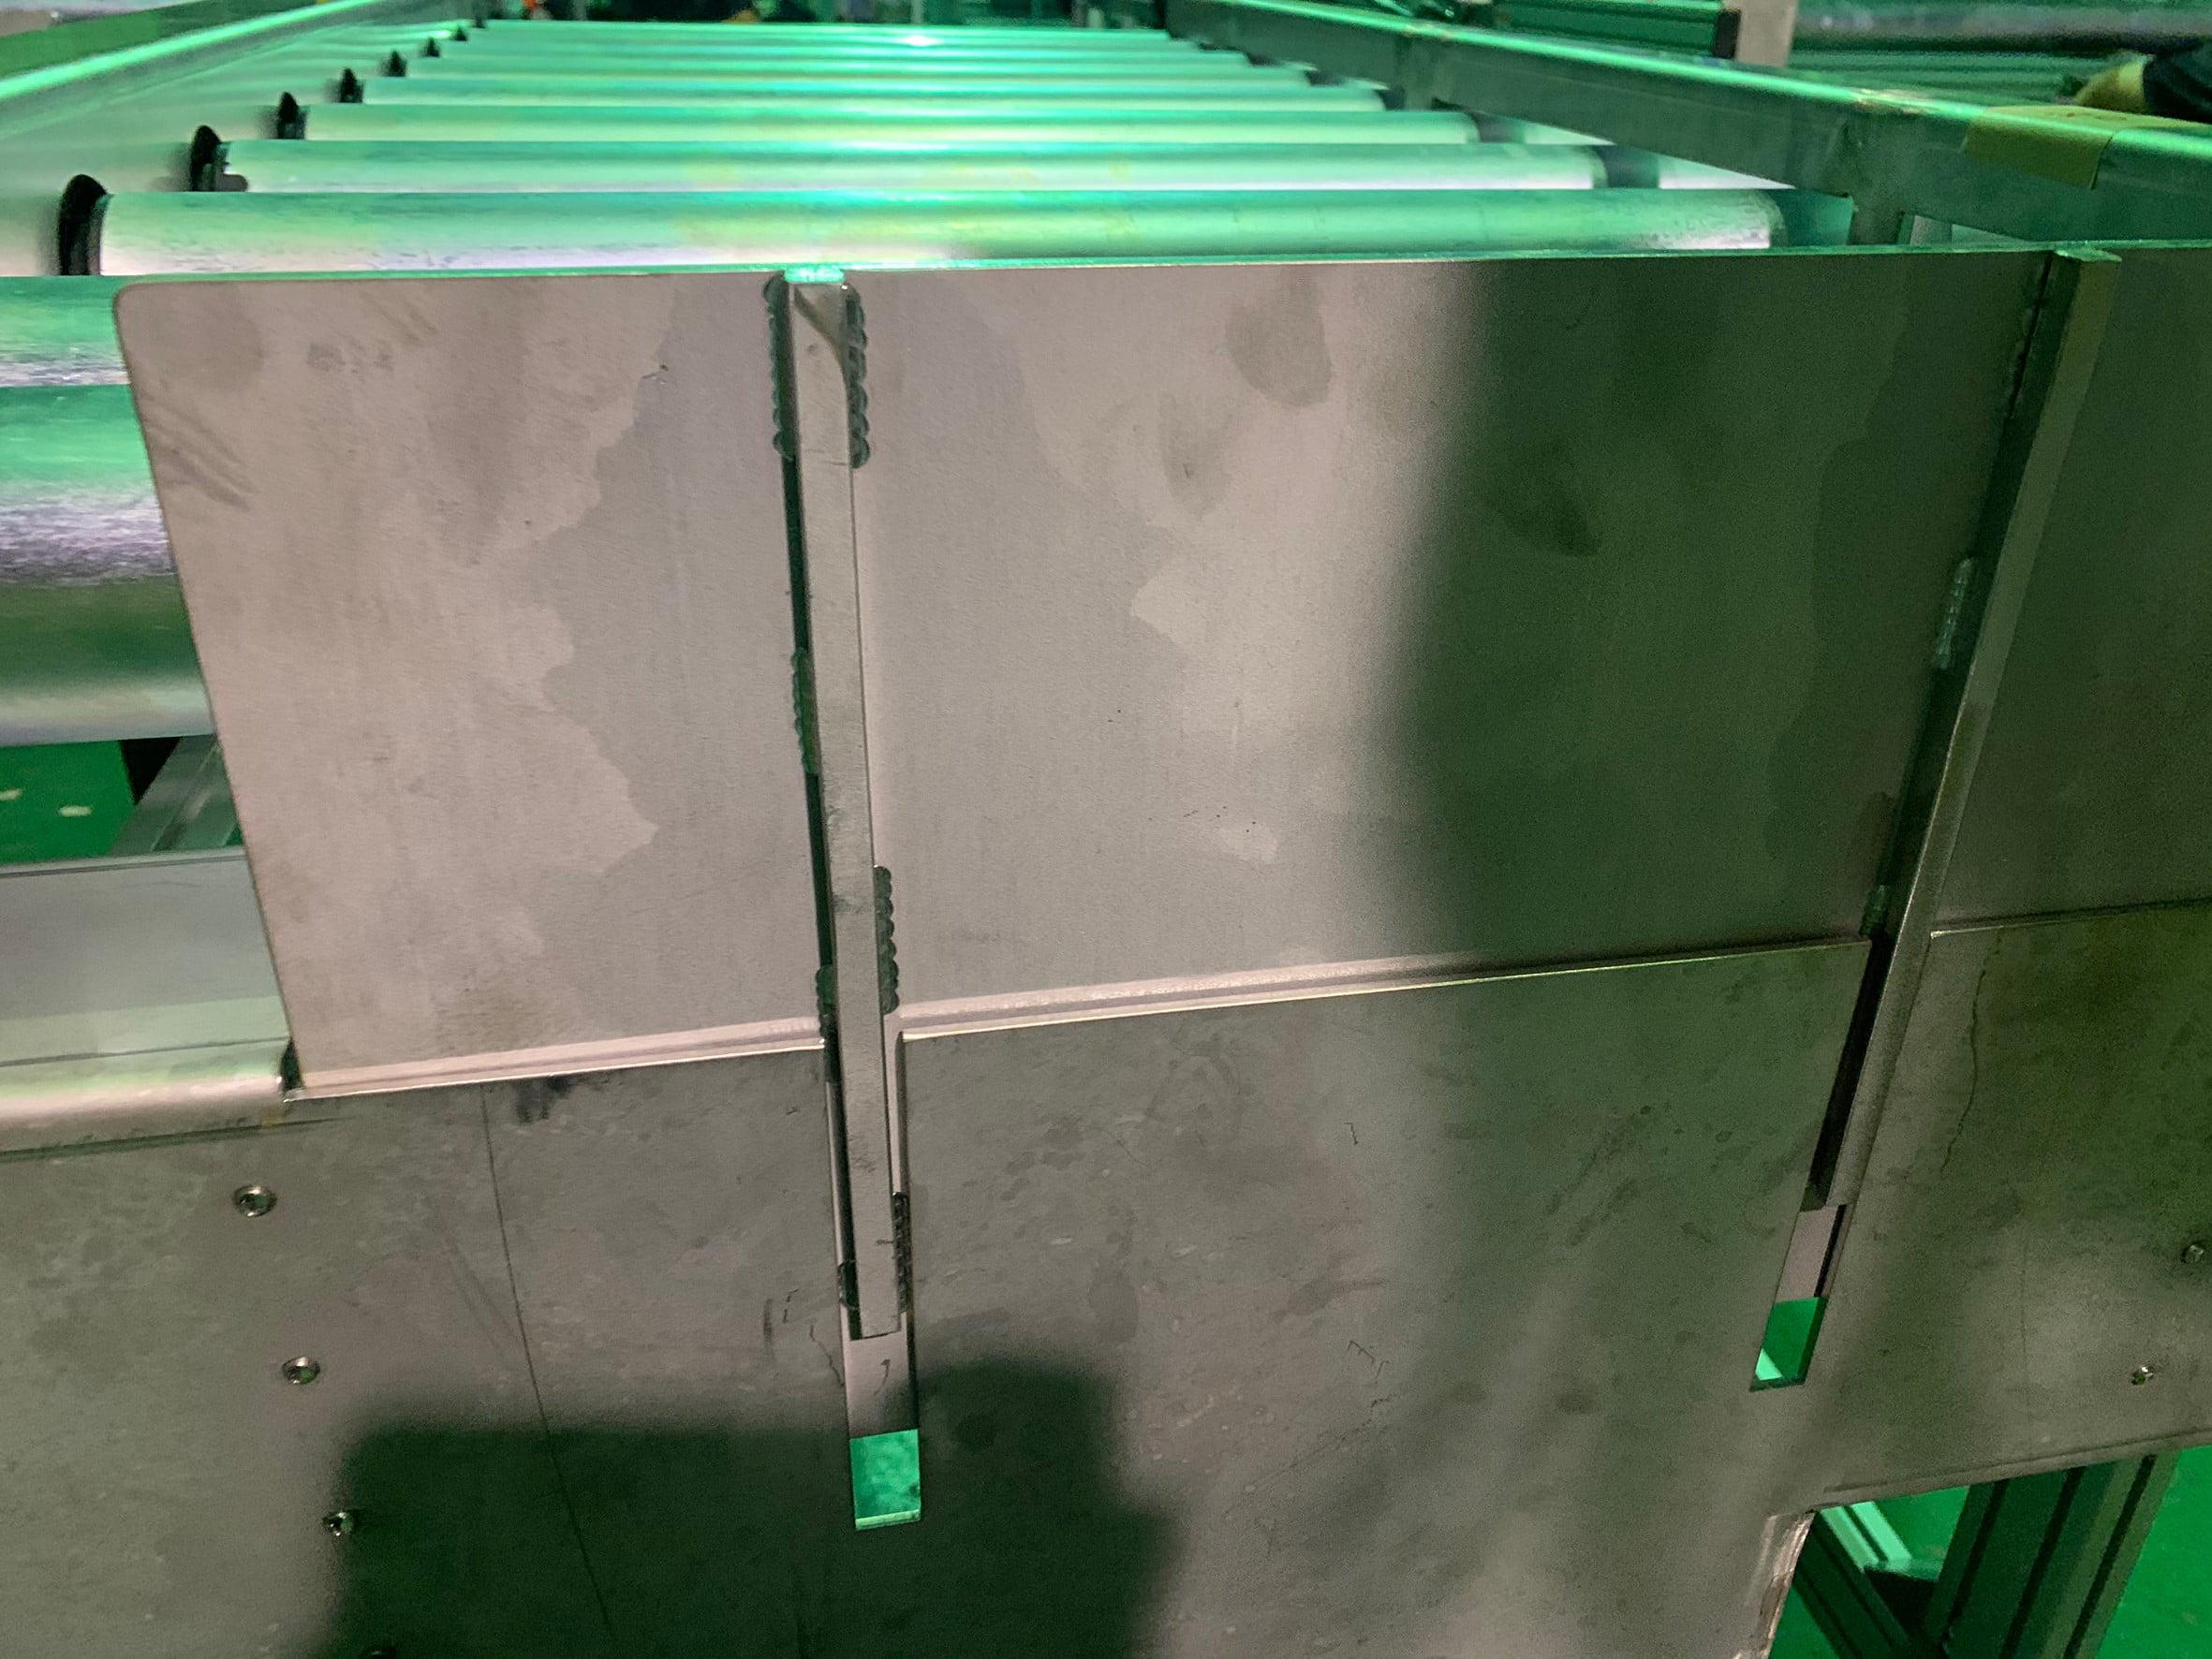 Folding power roller conveyor-Lichen Conveyor Equipment Co., Ltd.